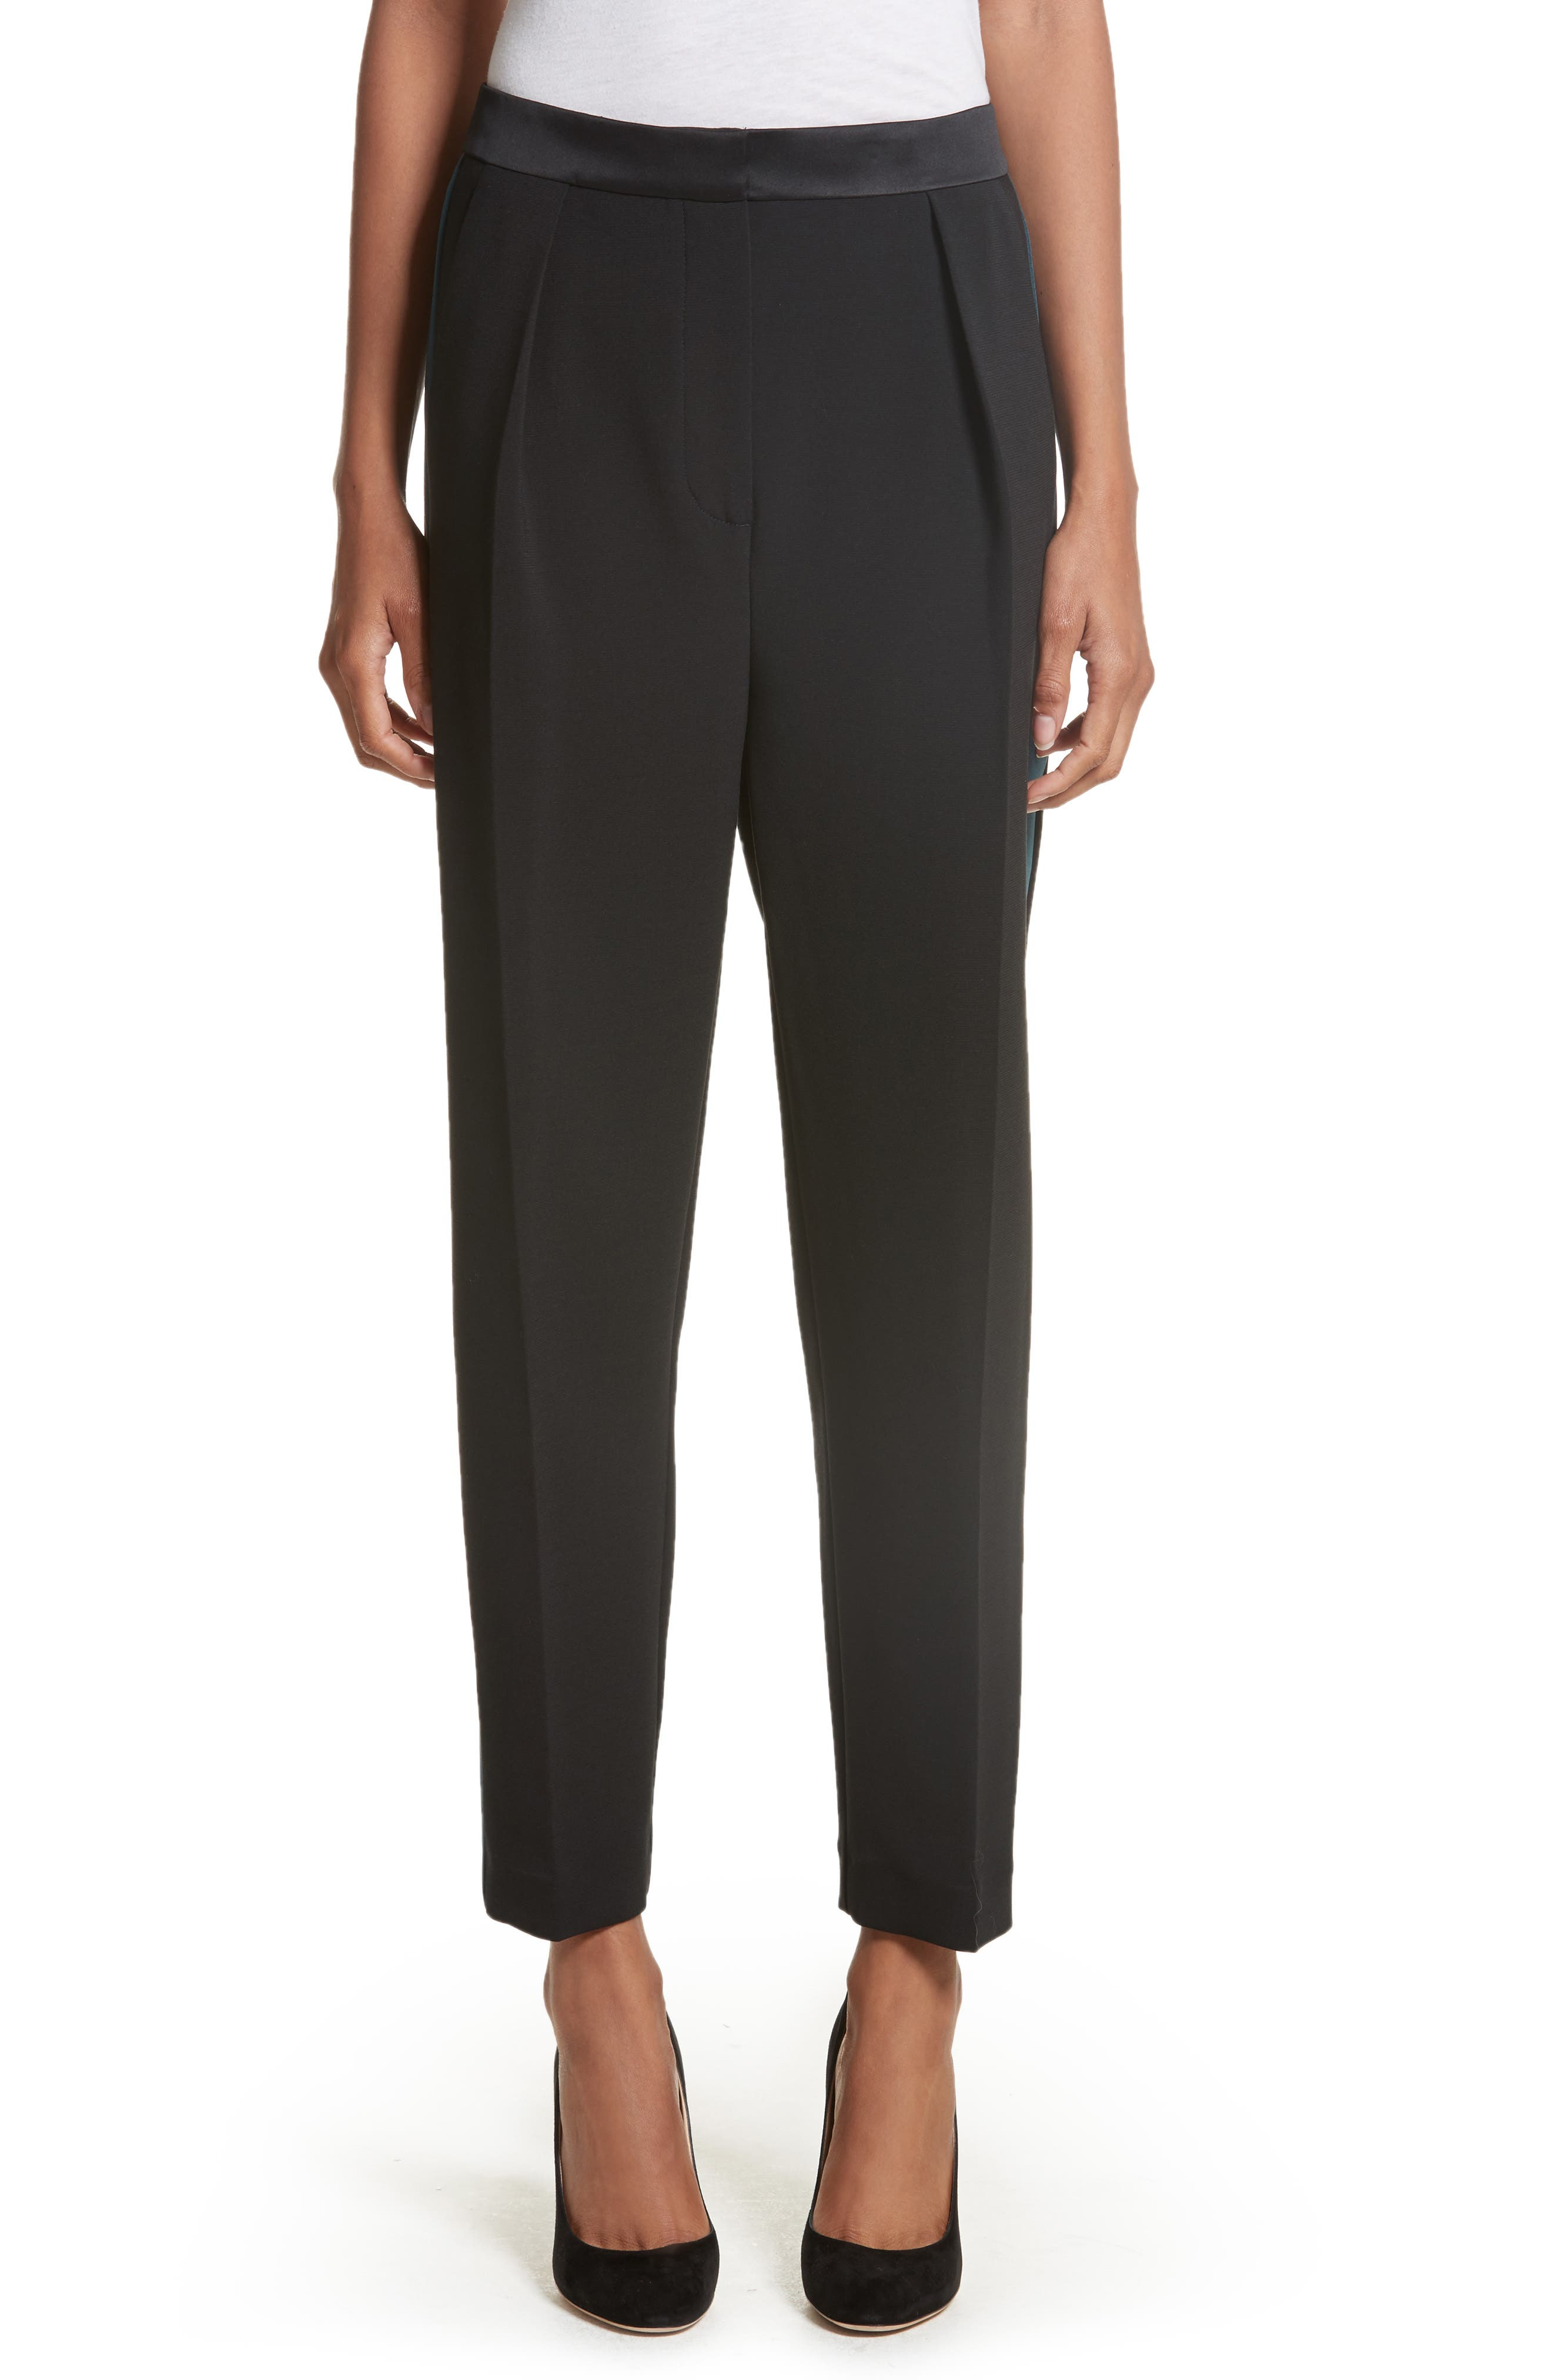 Surikov Crop Tuxedo Pants,                         Main,                         color, Black/ Peacock